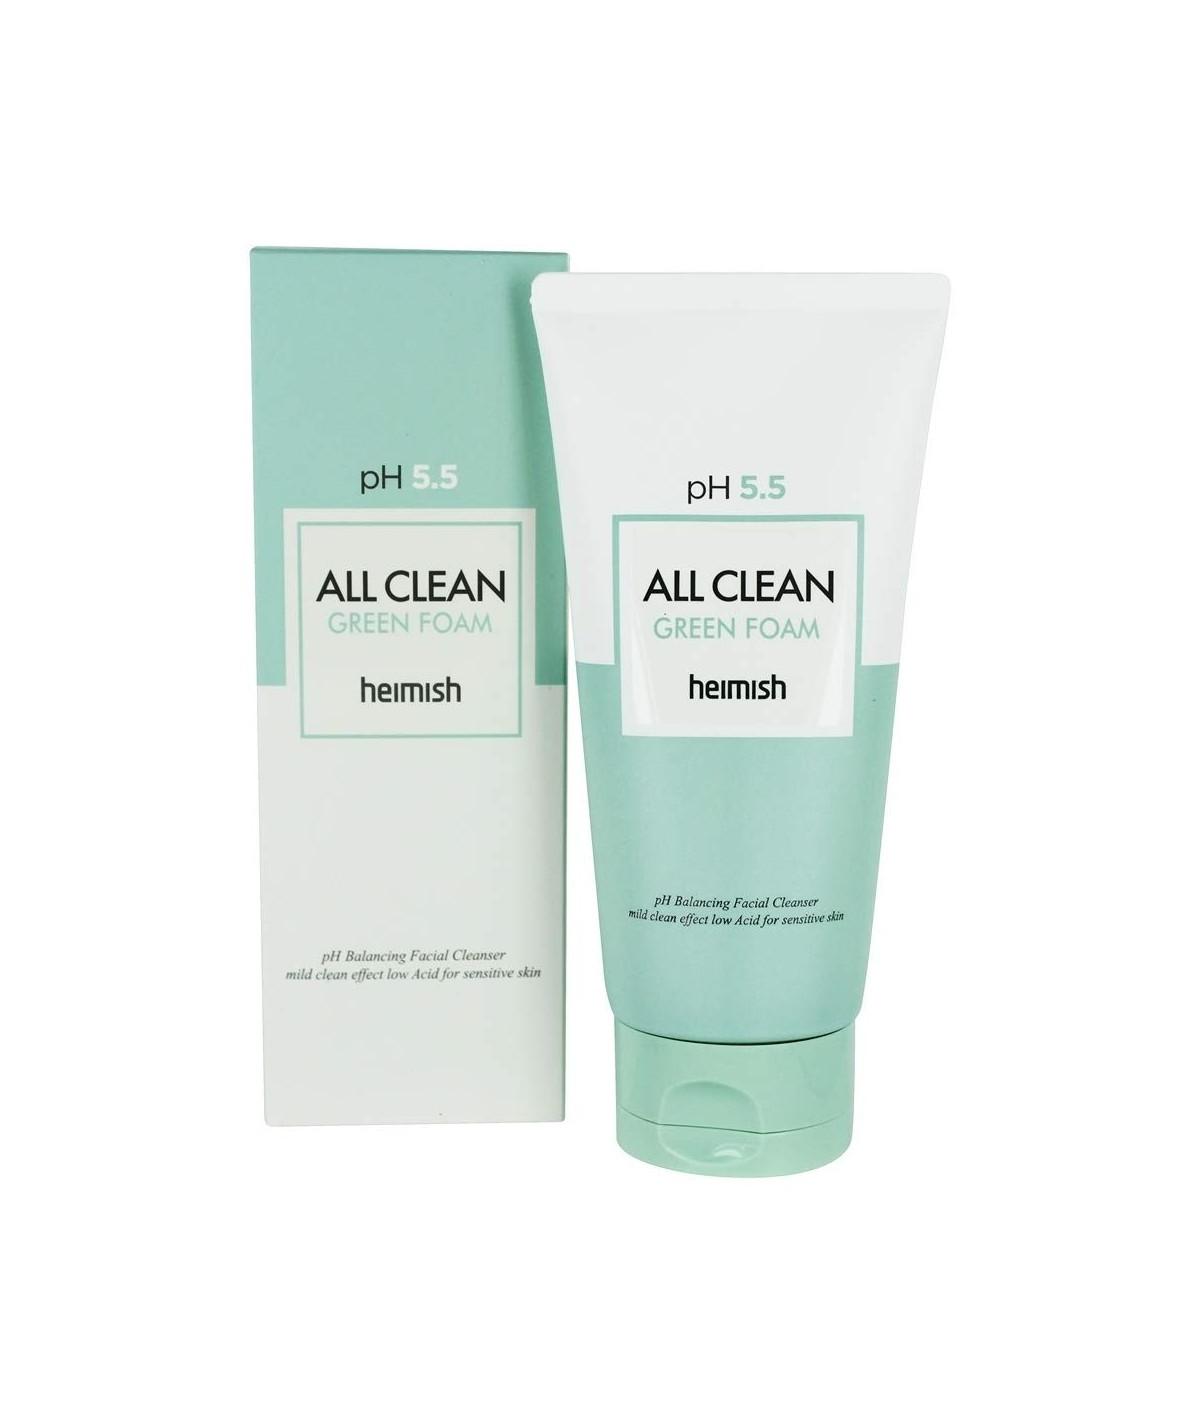 Слабокислотный гель для умывания Heimish pH 5.5 All Clean Green Foam - 150 мл